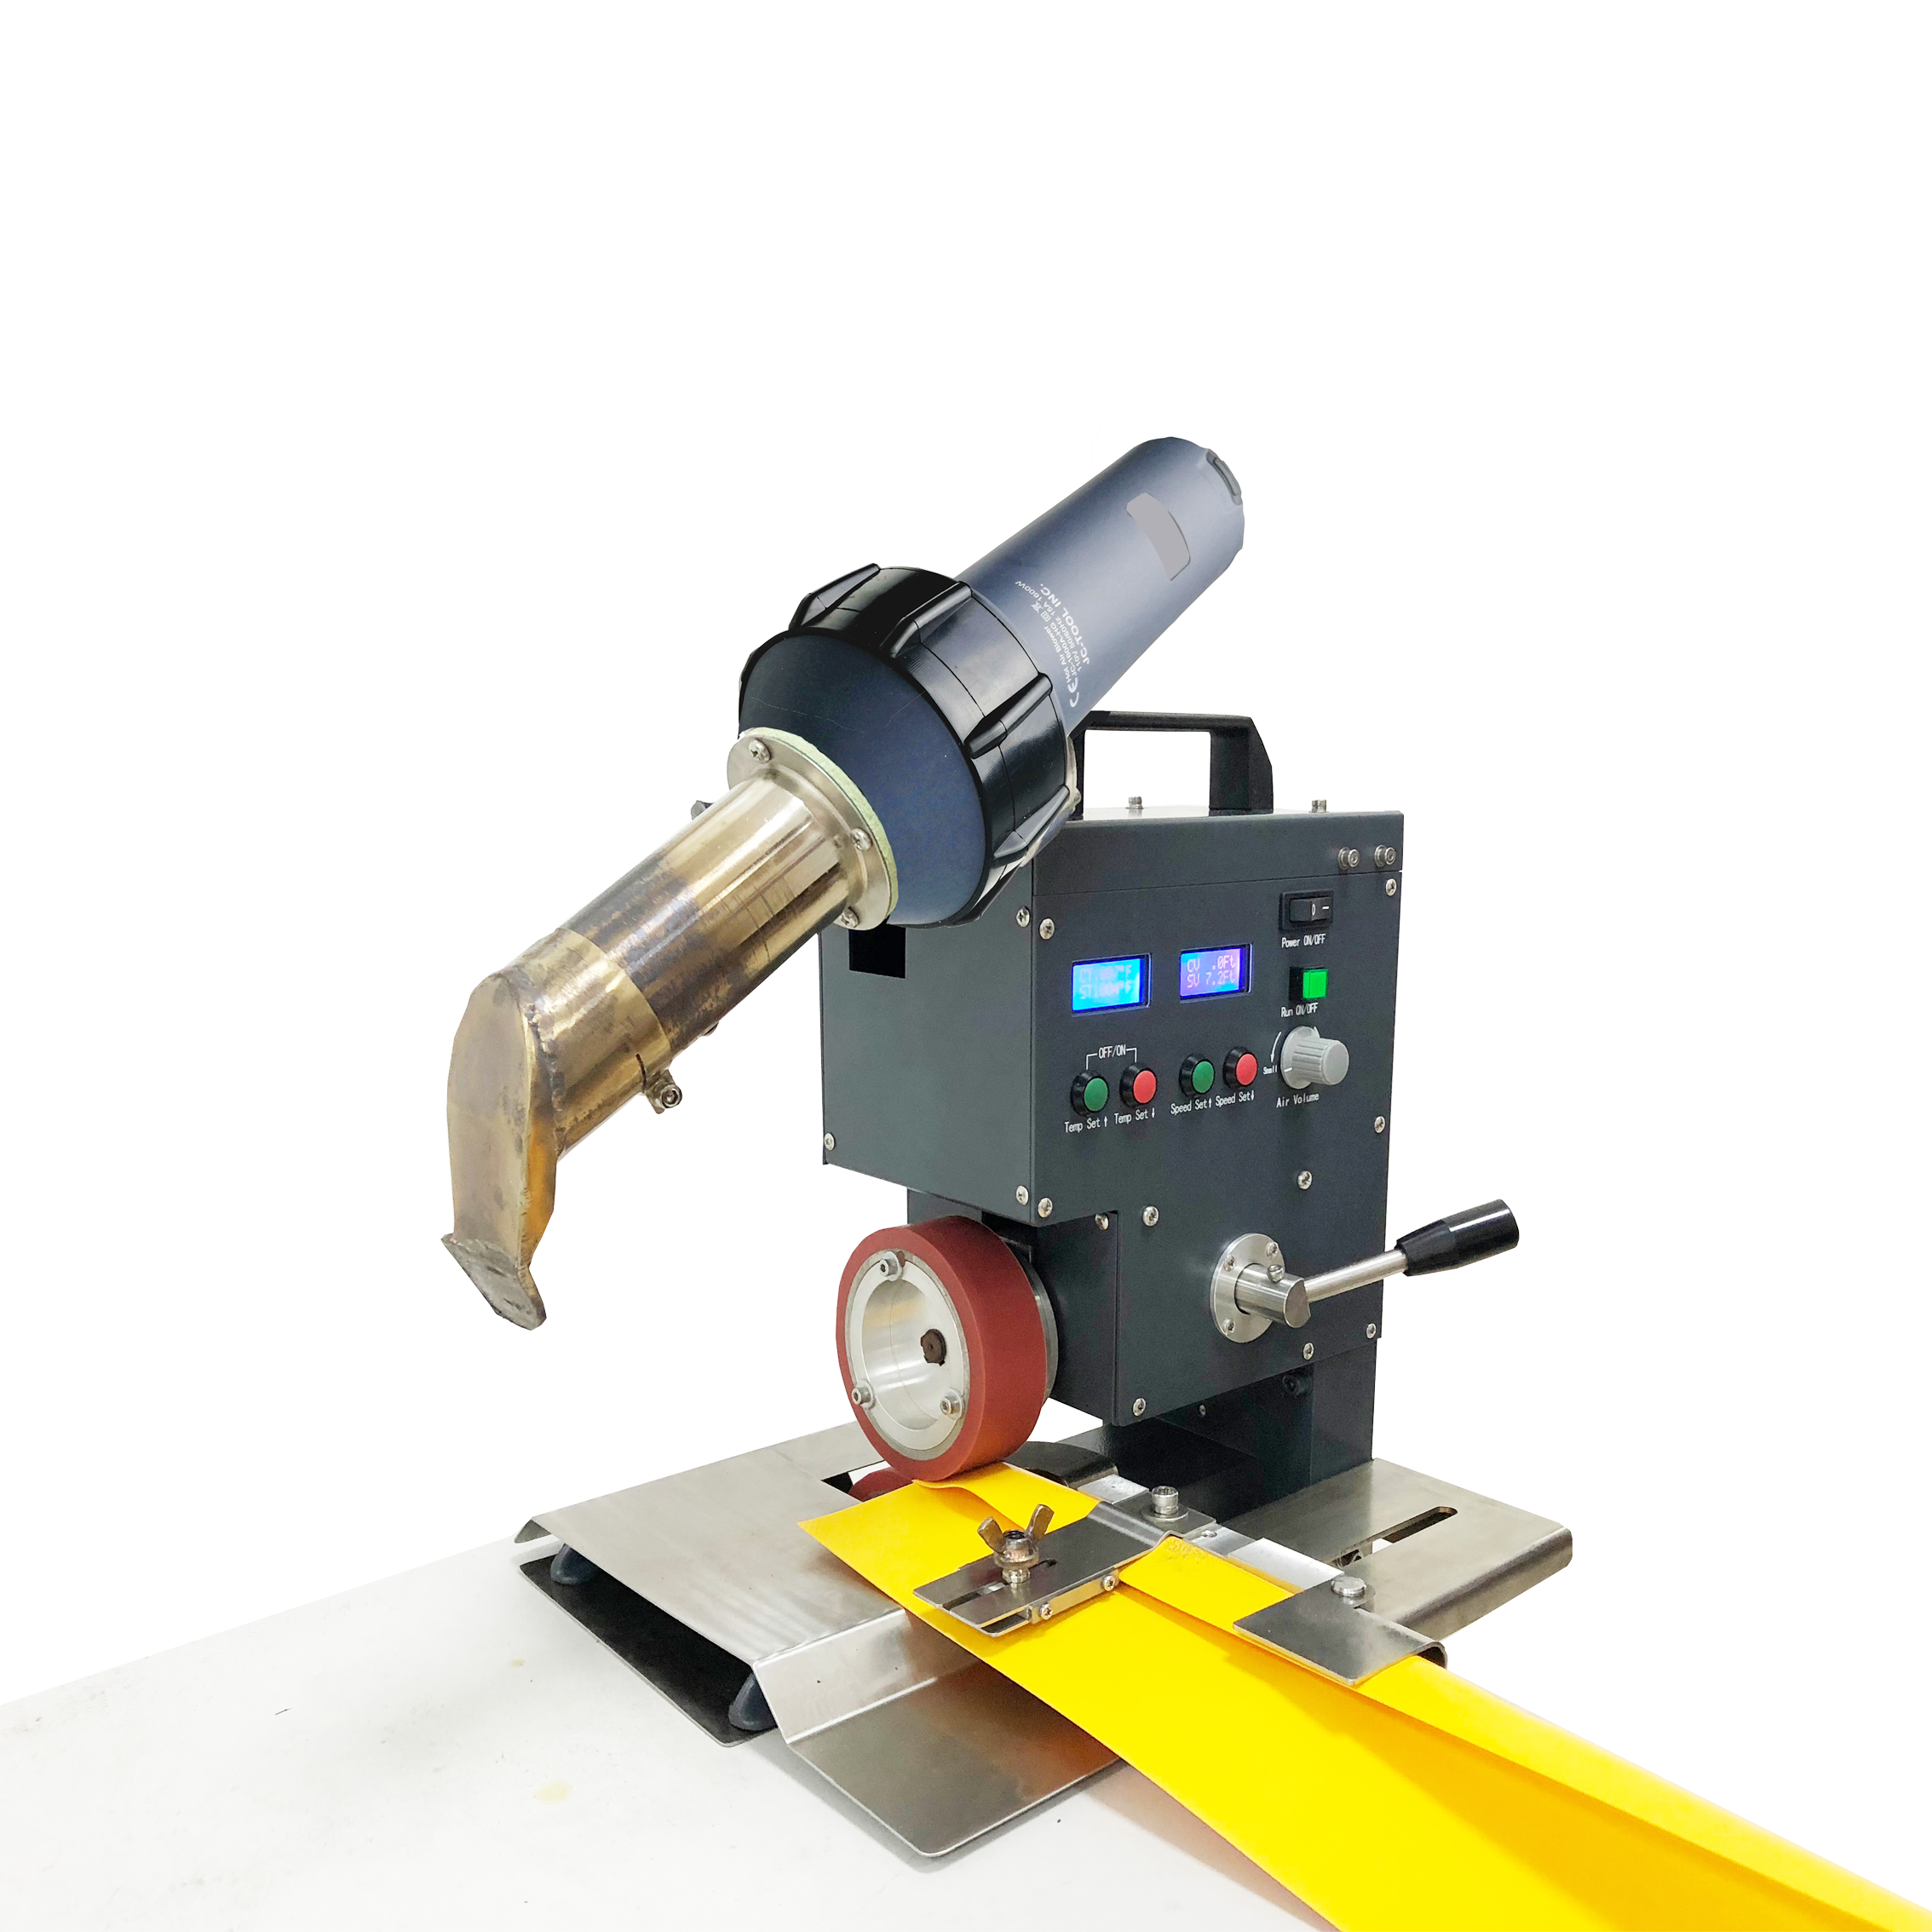 JC-3600-TM Industrial Machine Table Mounted Plastic Hot Air Welder